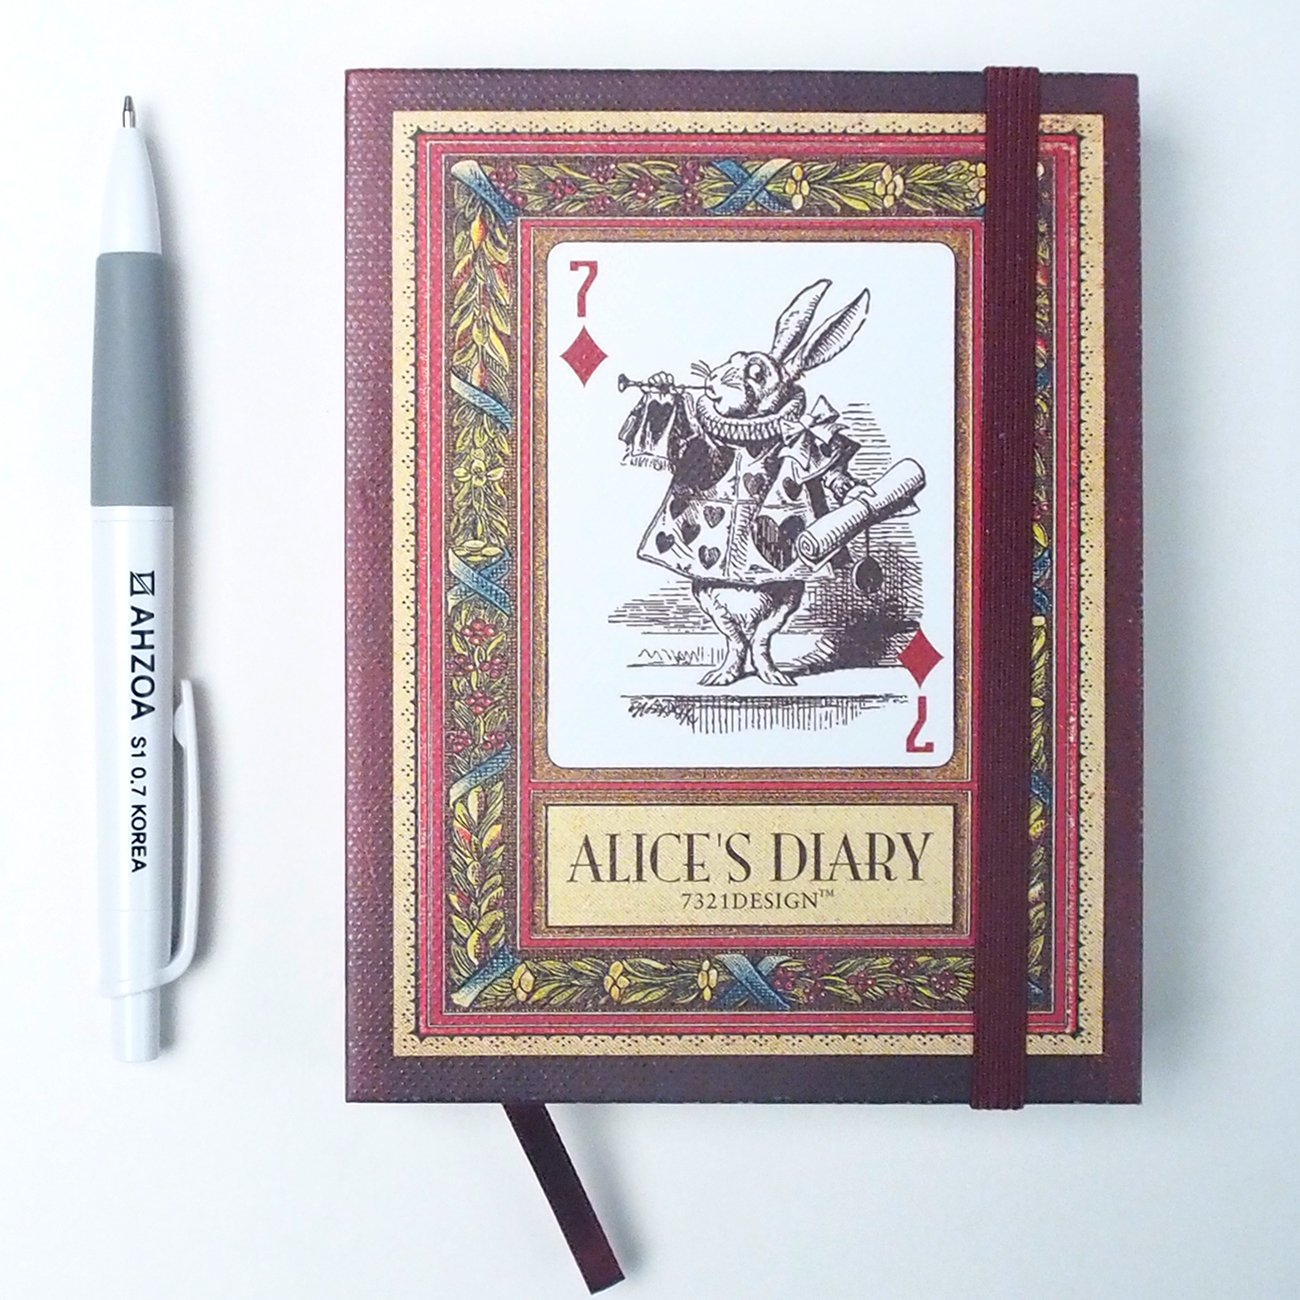 Amazon.com : Alices Diary with AHZOA Pencil, Undated ...